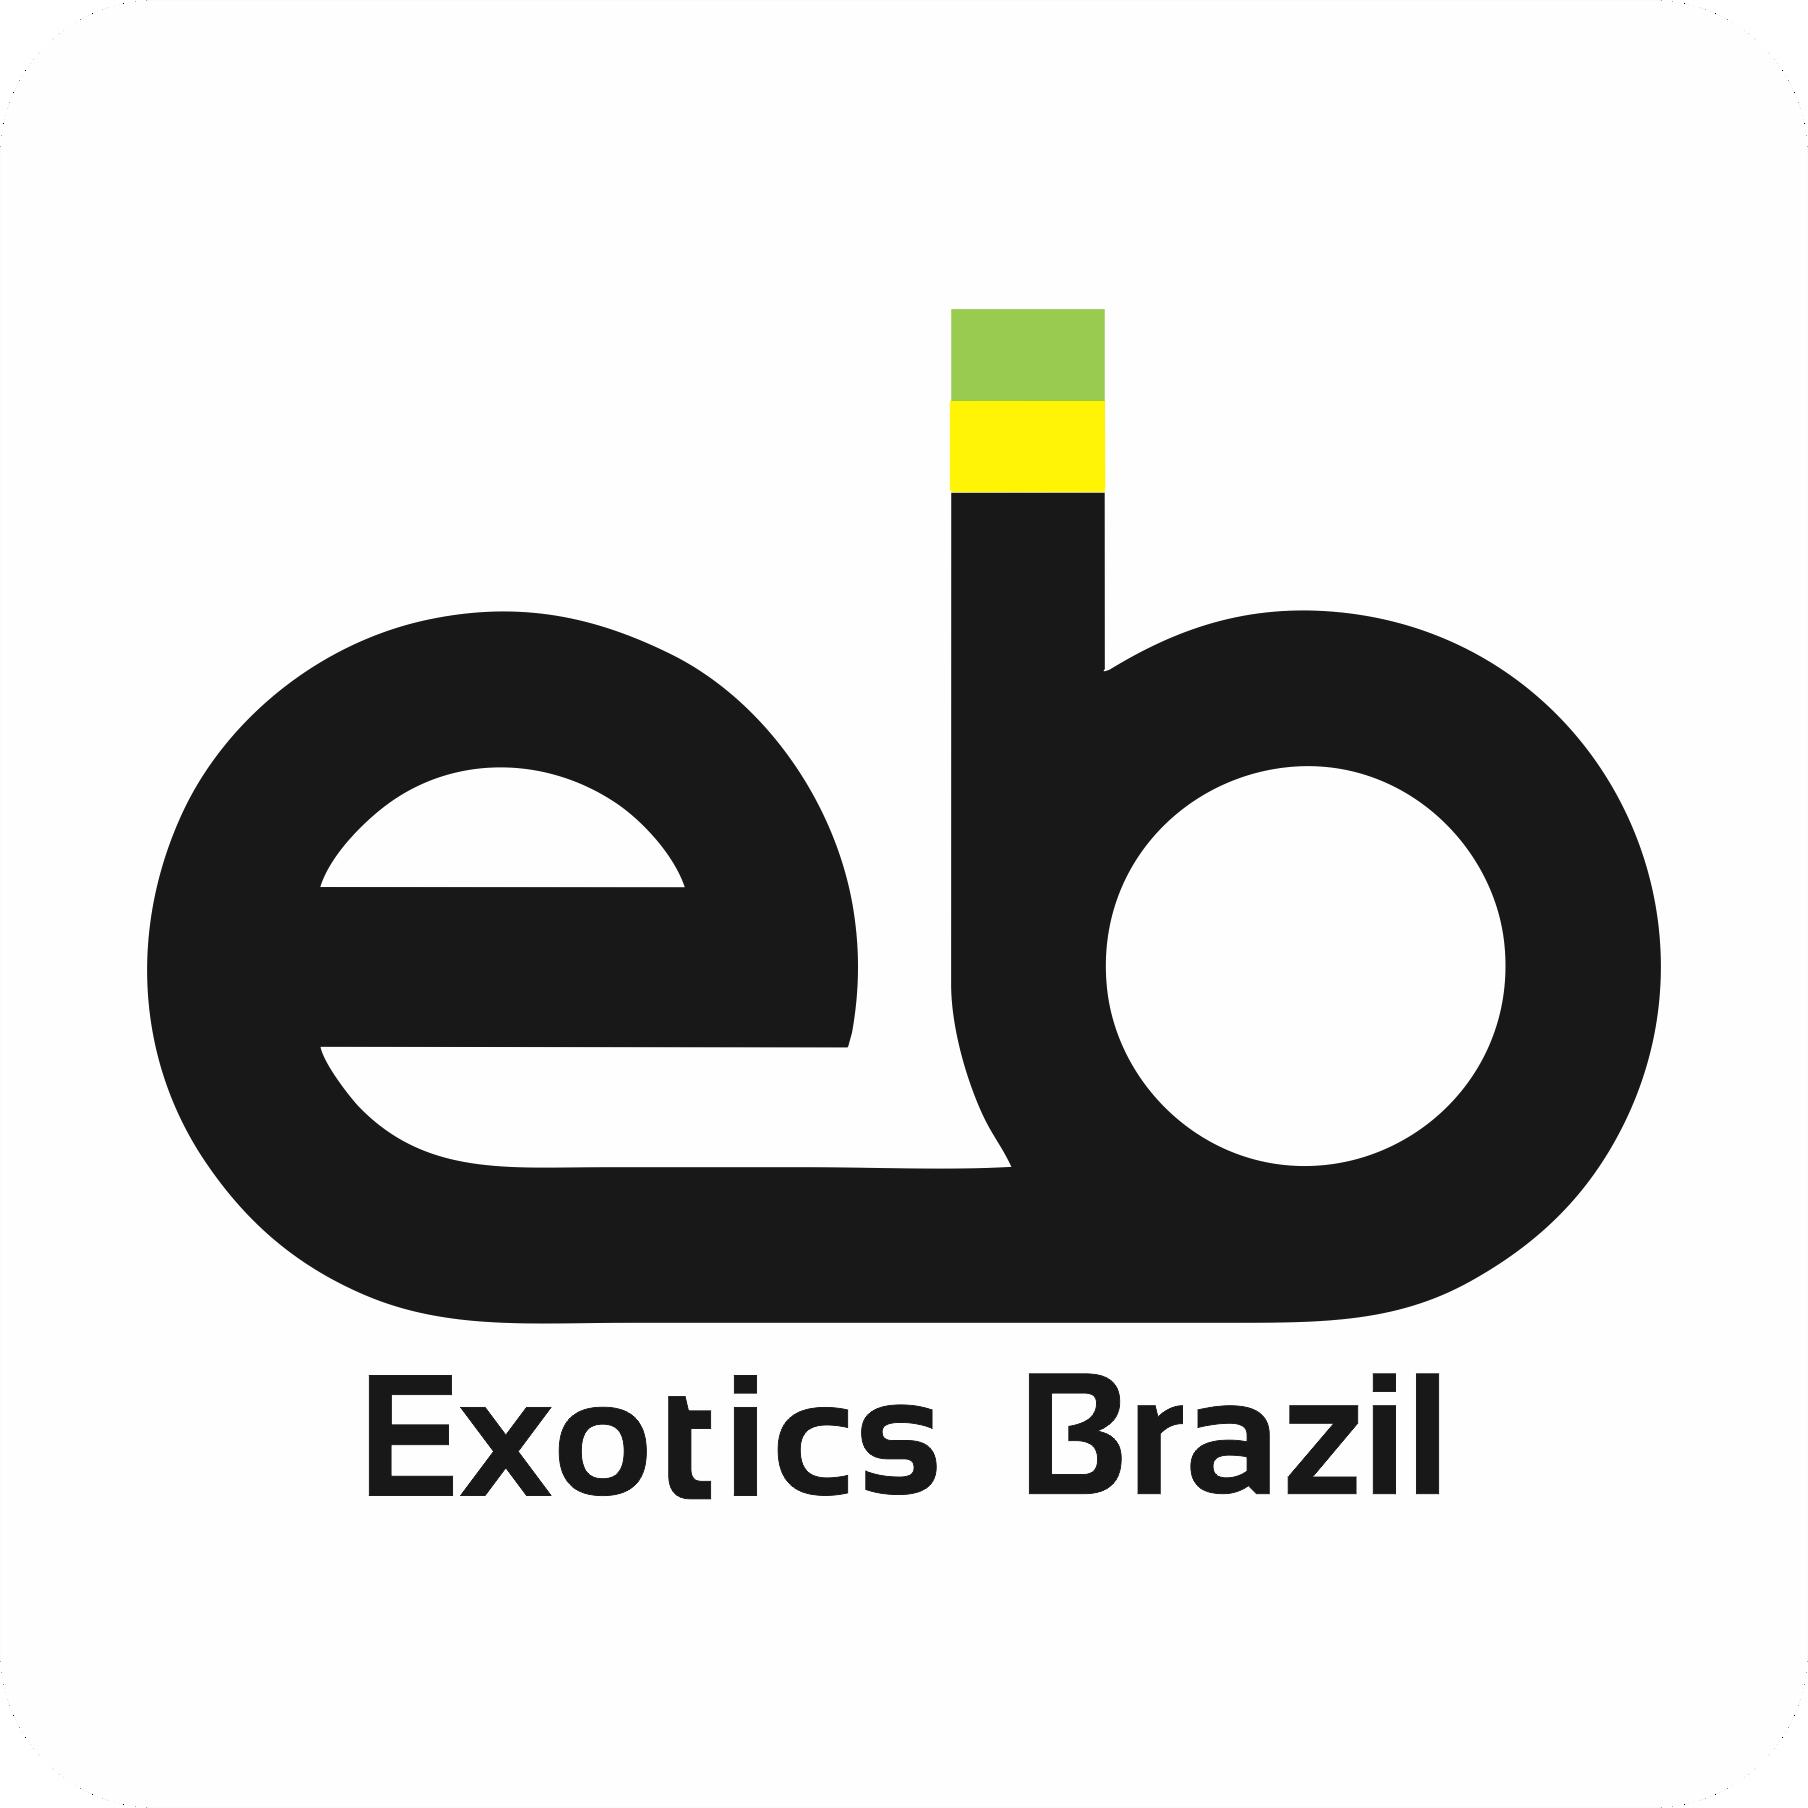 Exotics Brazil